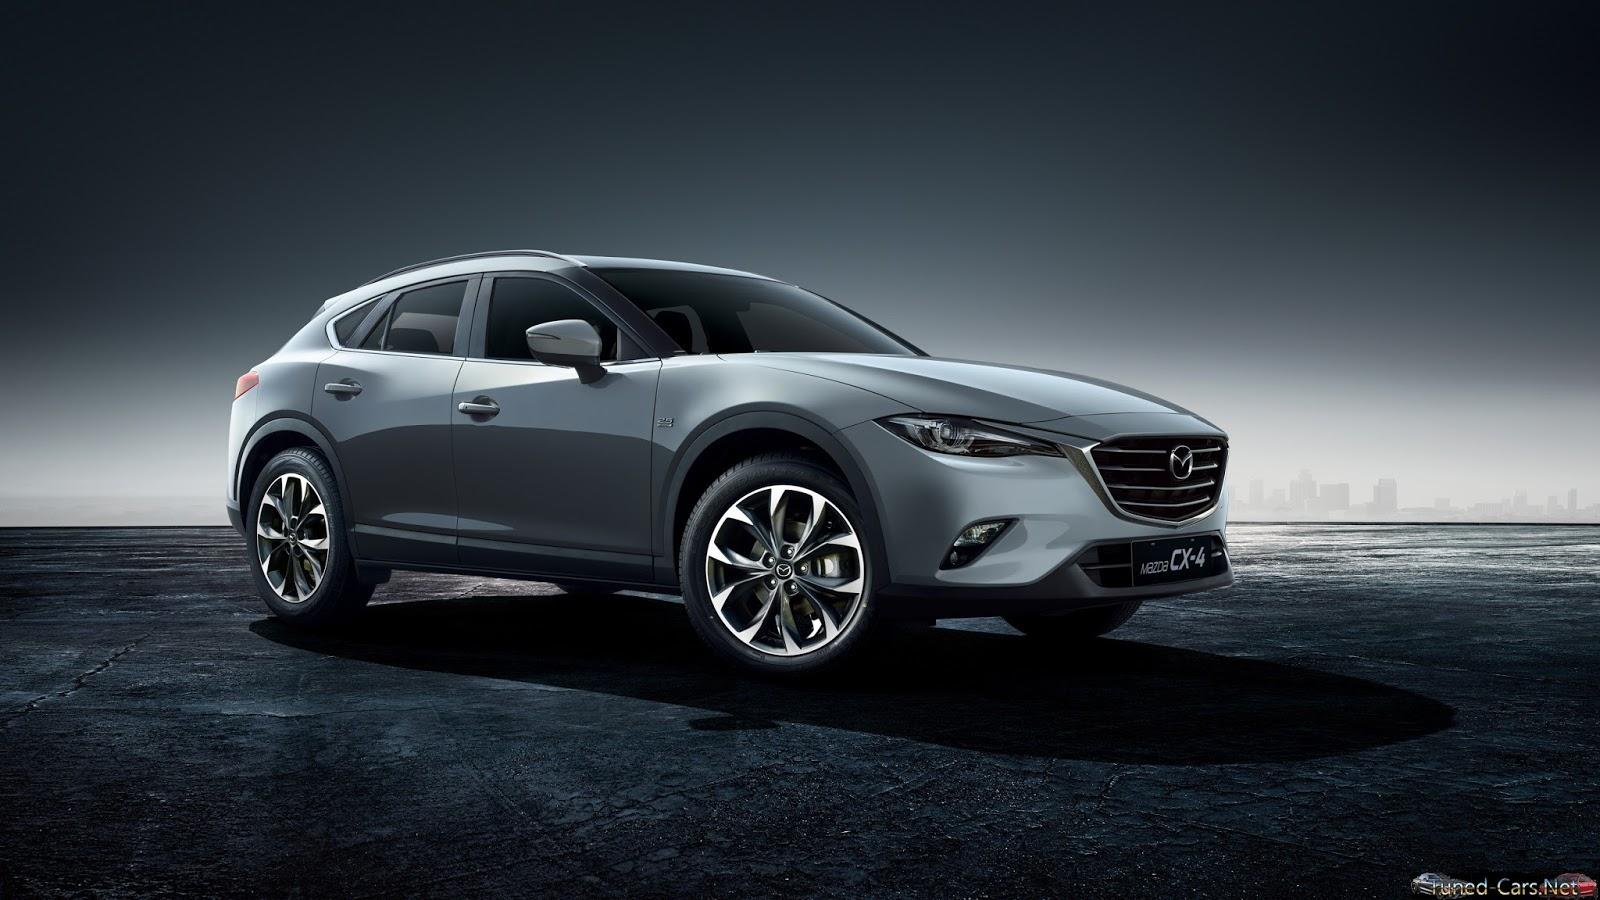 Mazda Cx 4 Car